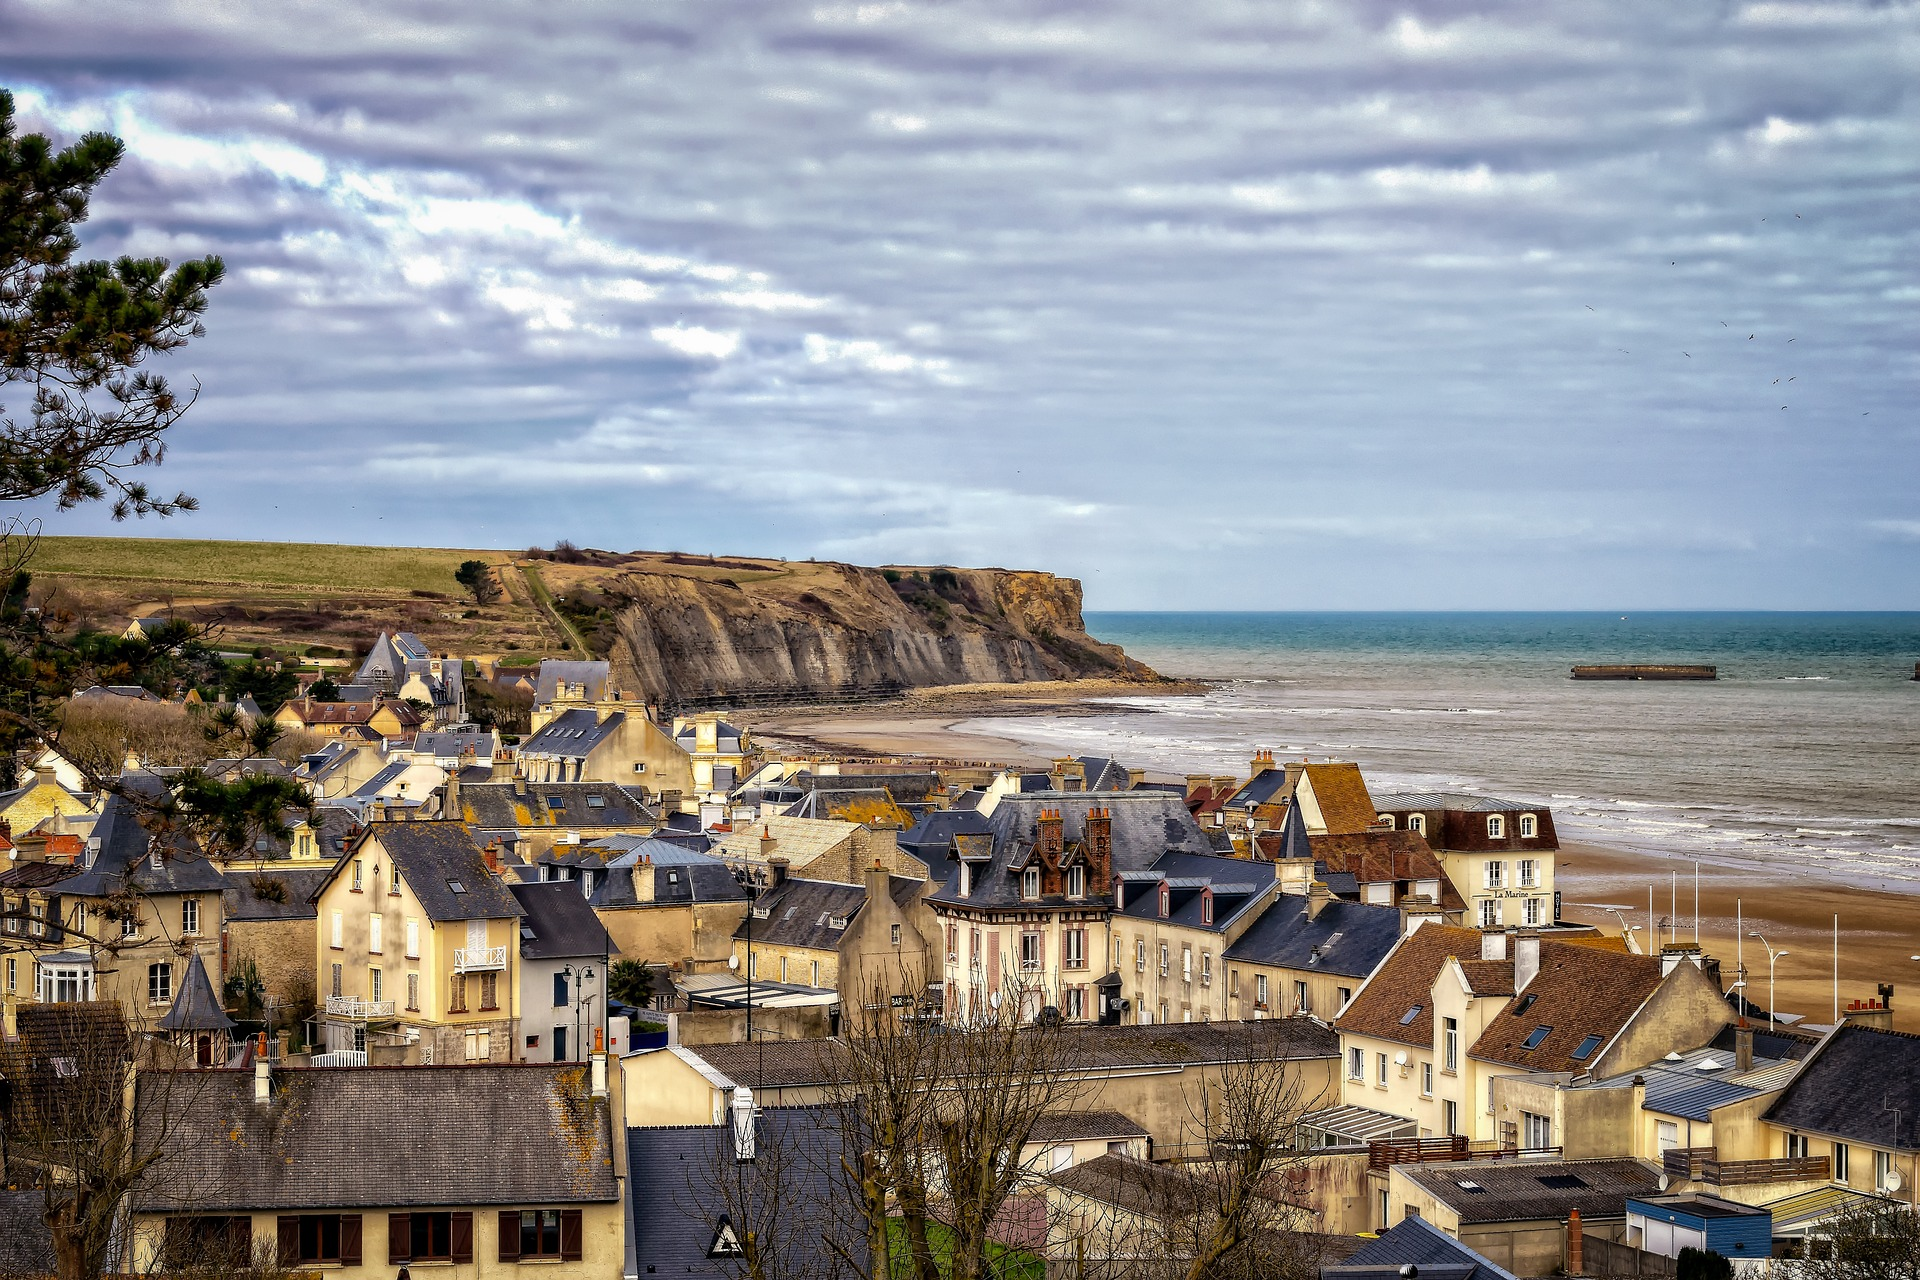 Normandy Landing beaches tour